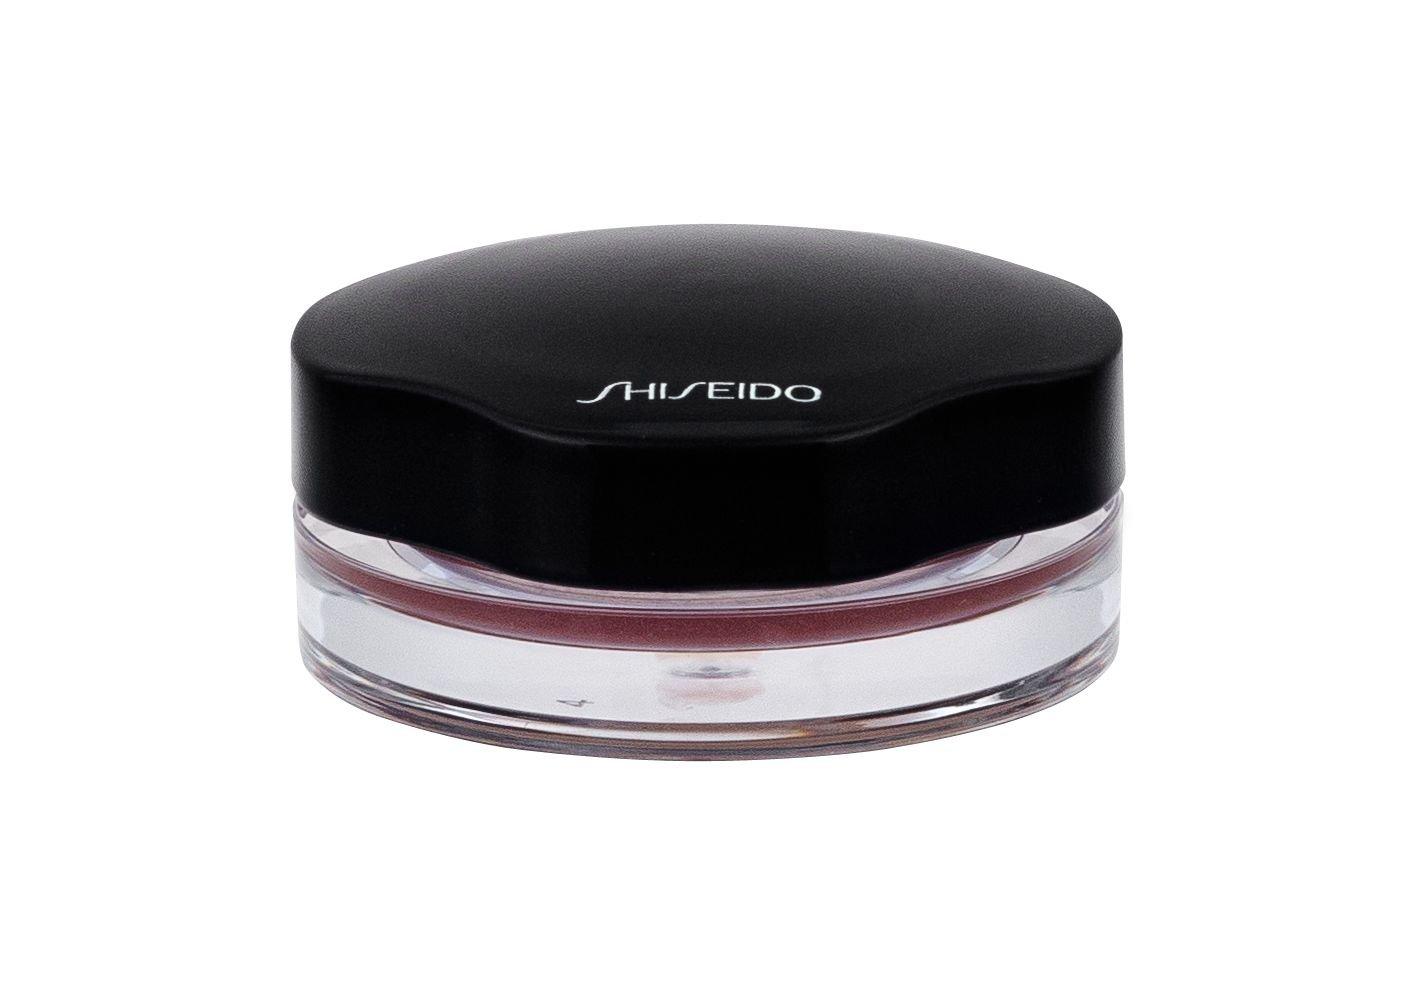 Shiseido Shimmering Cream Eye Color Eye Shadow 6ml VI730